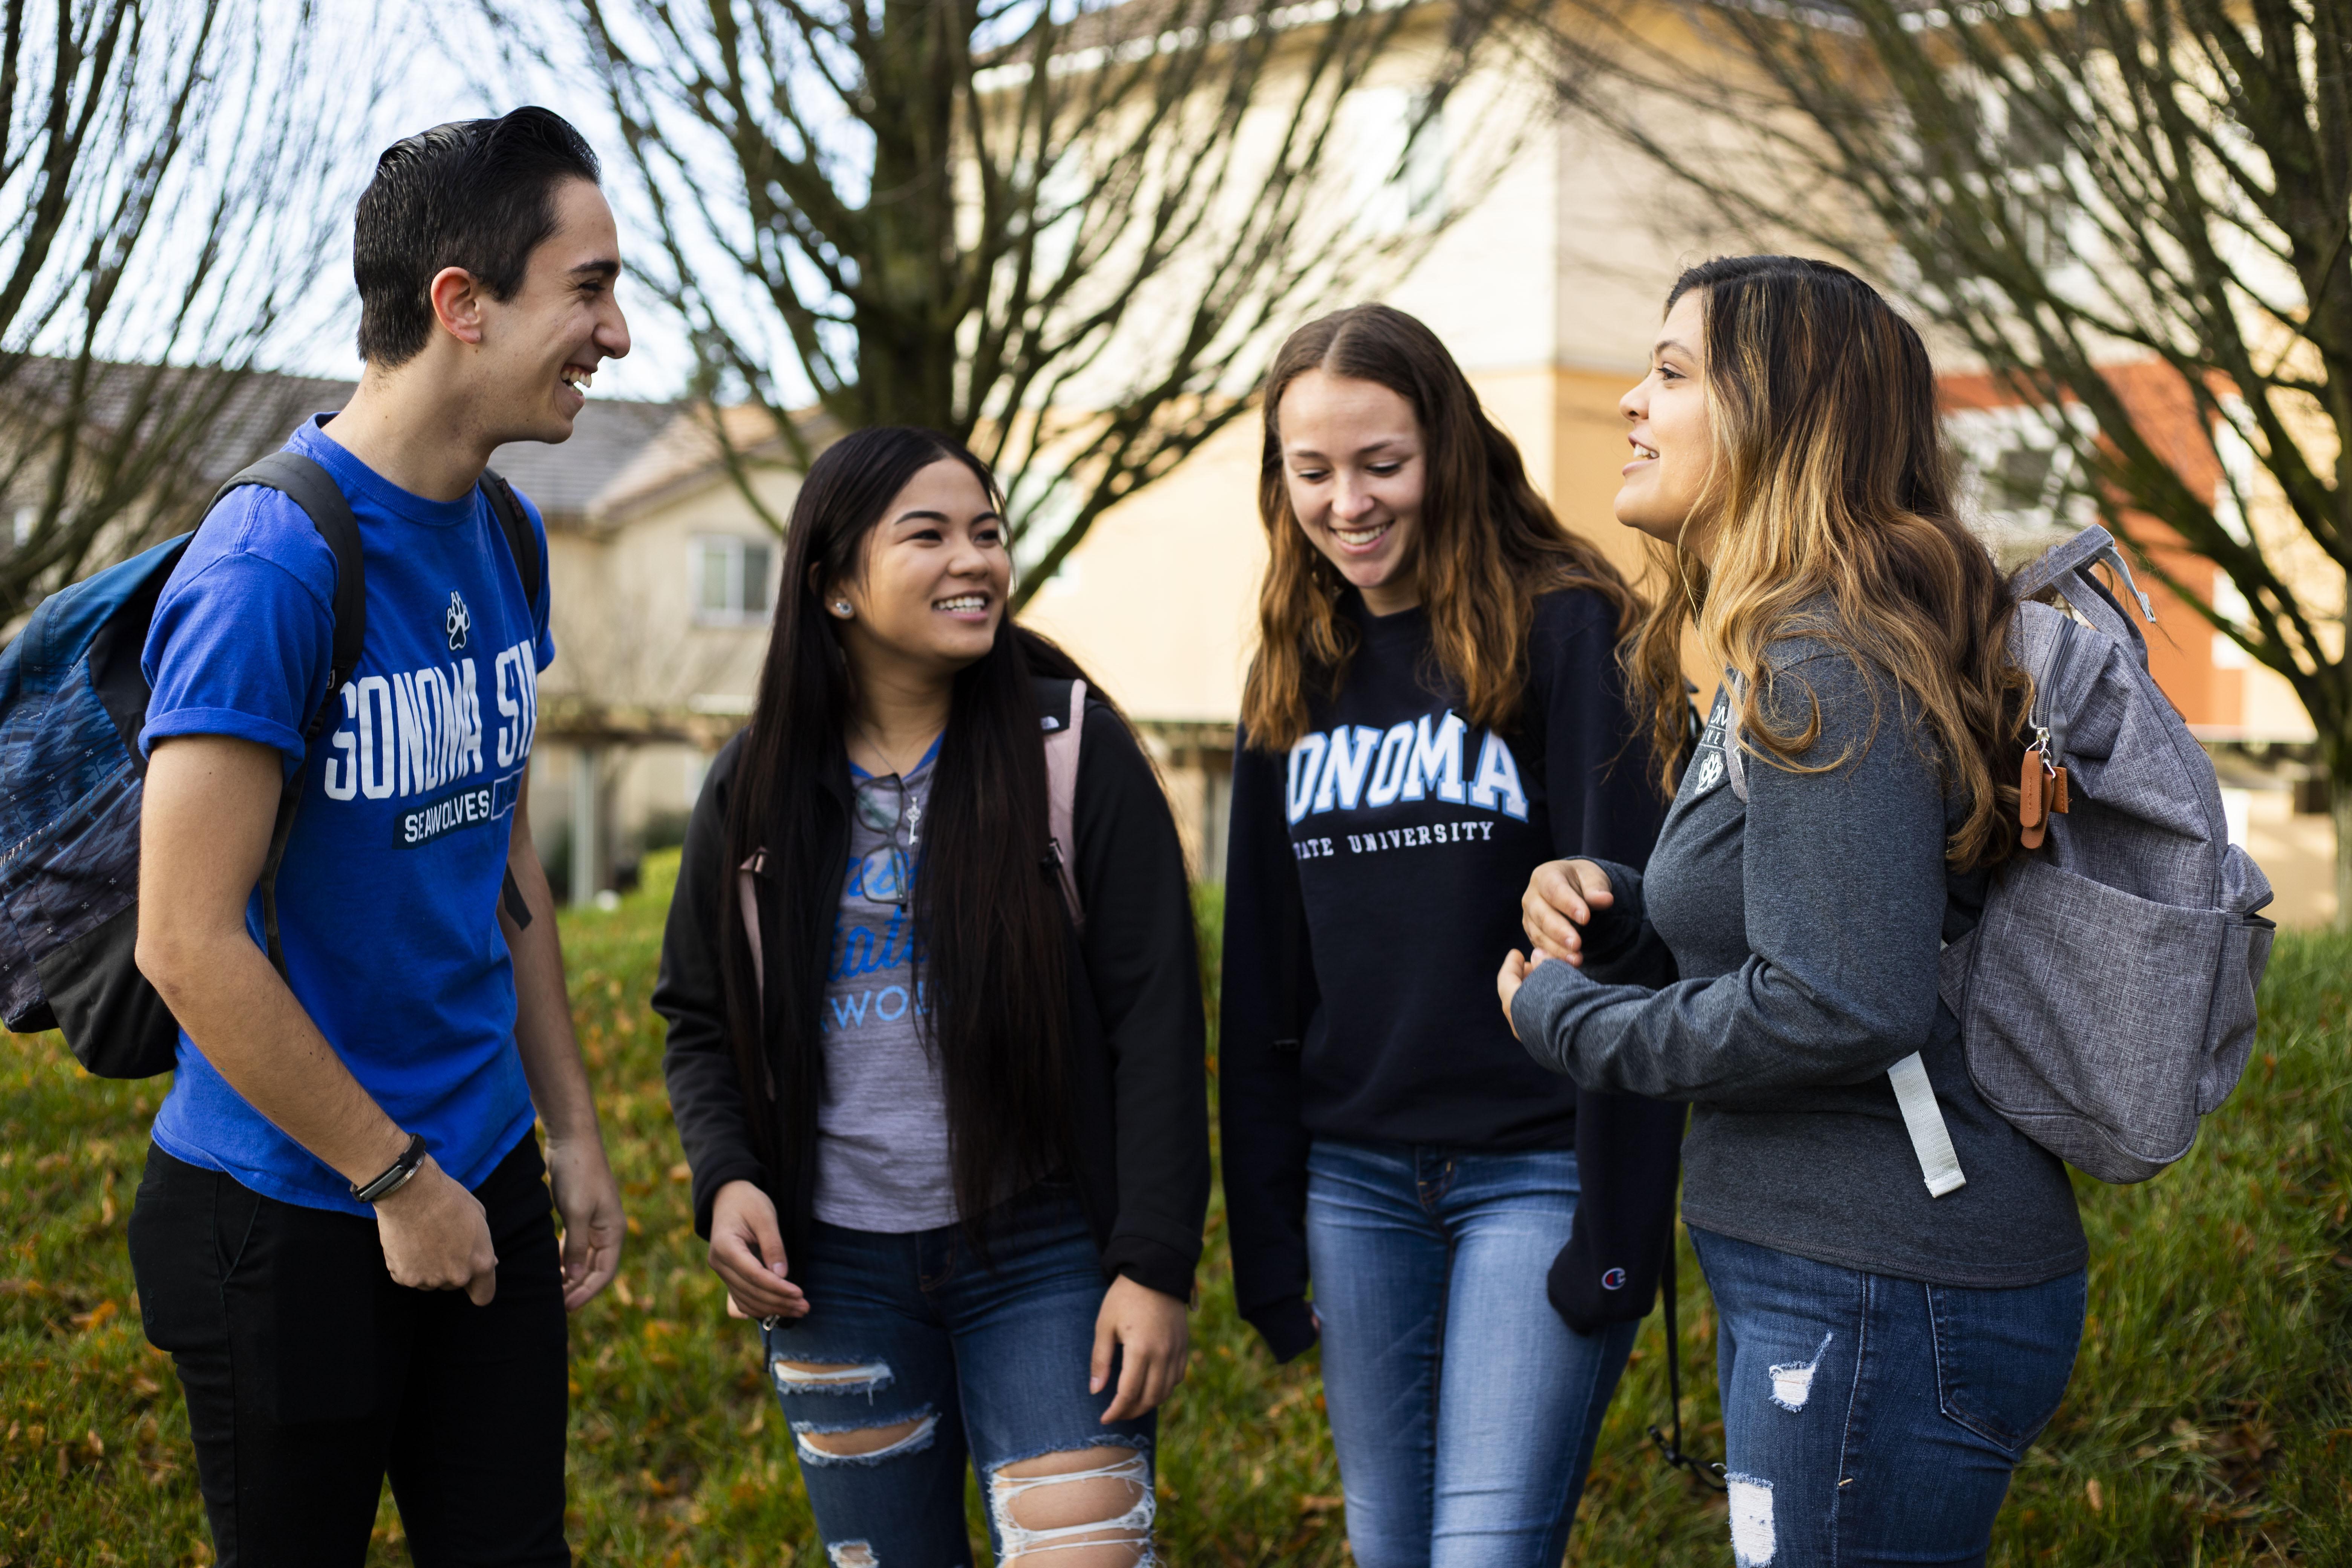 Four Students Talking in SSU Logo